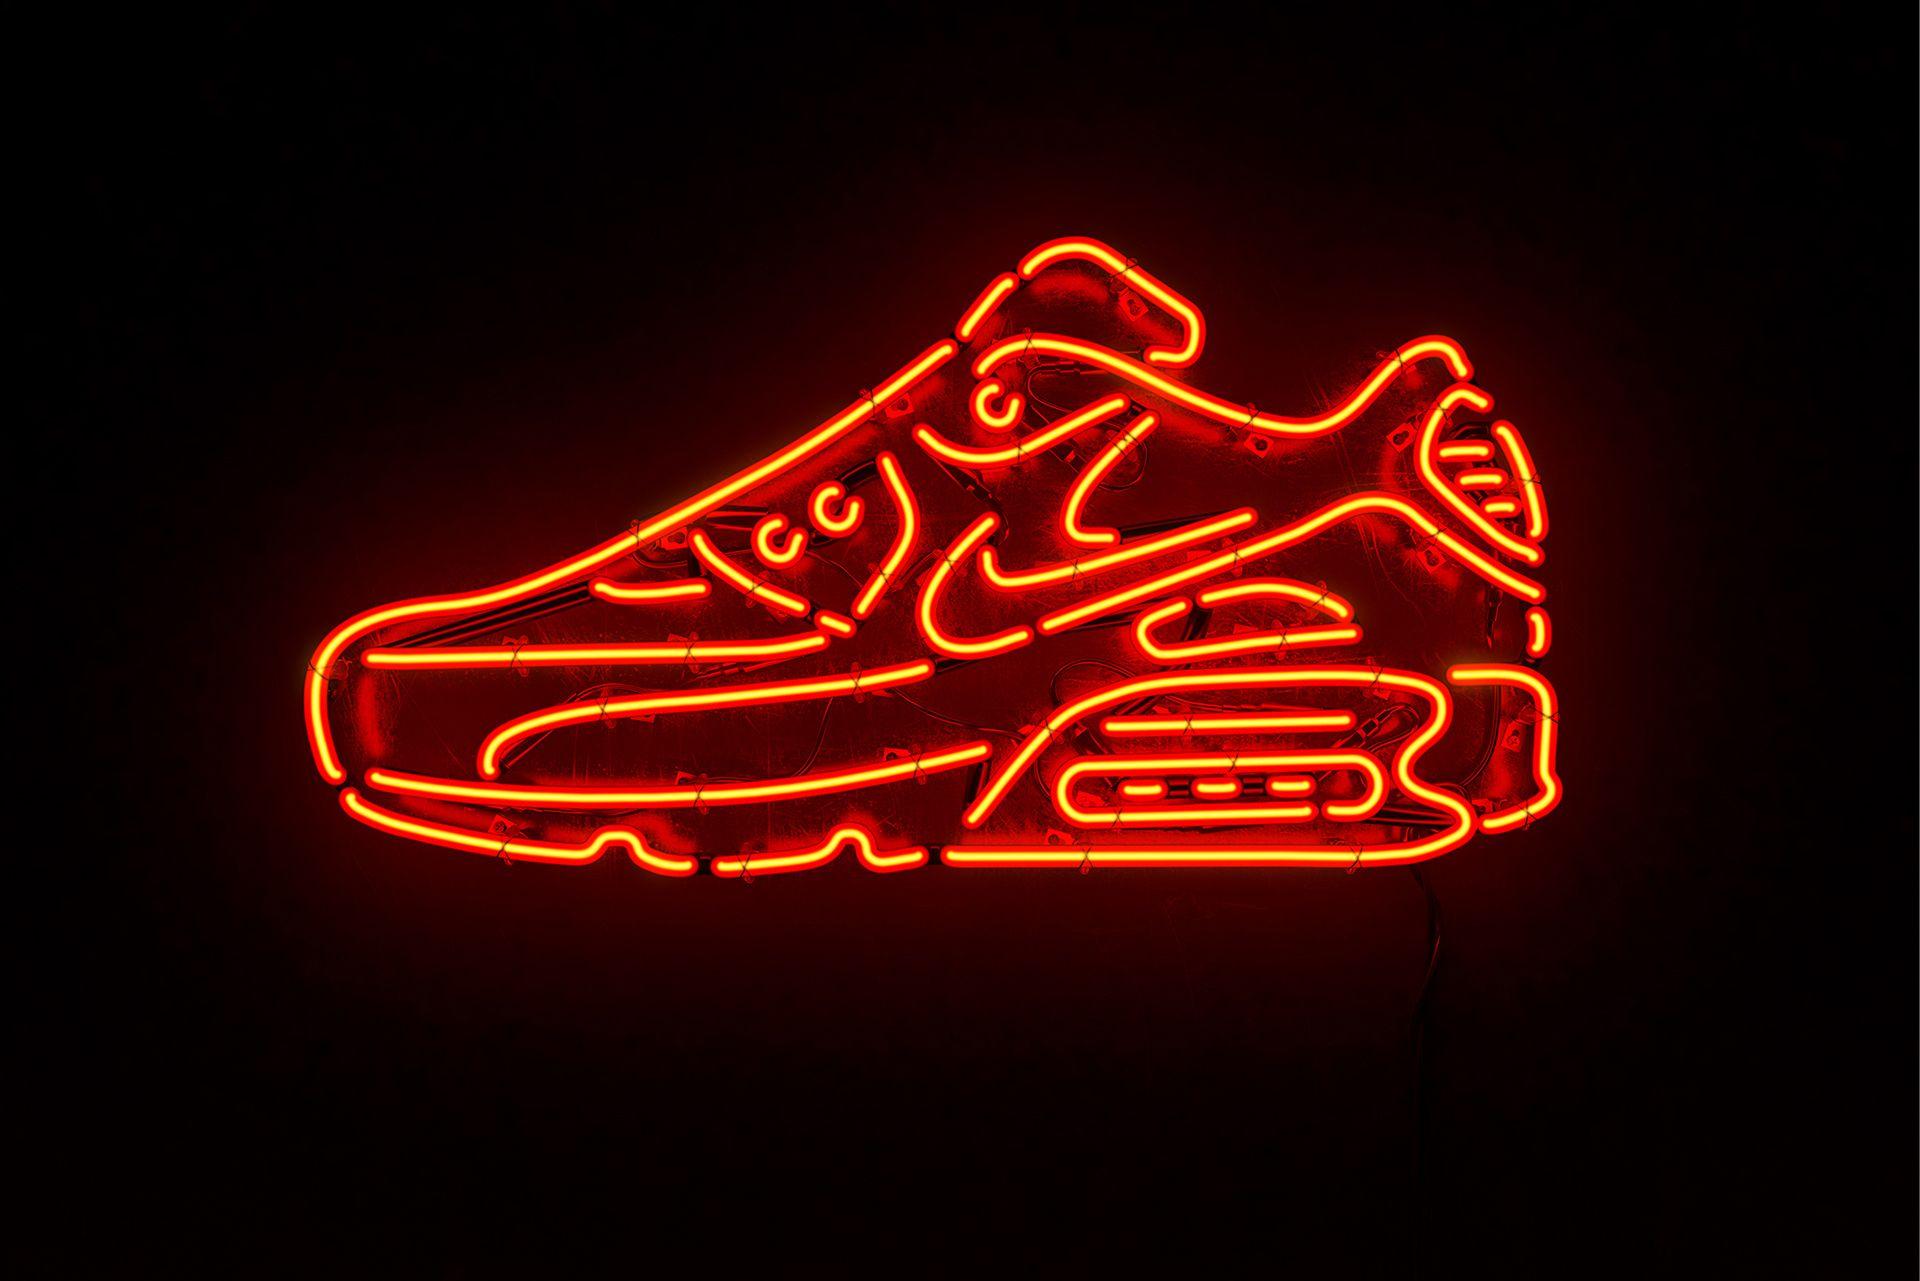 Telégrafo arco pierna  Nike Air Max 90 Neon 'On' by Rizon Parein | Neon, Nike neon, Nike air max 90